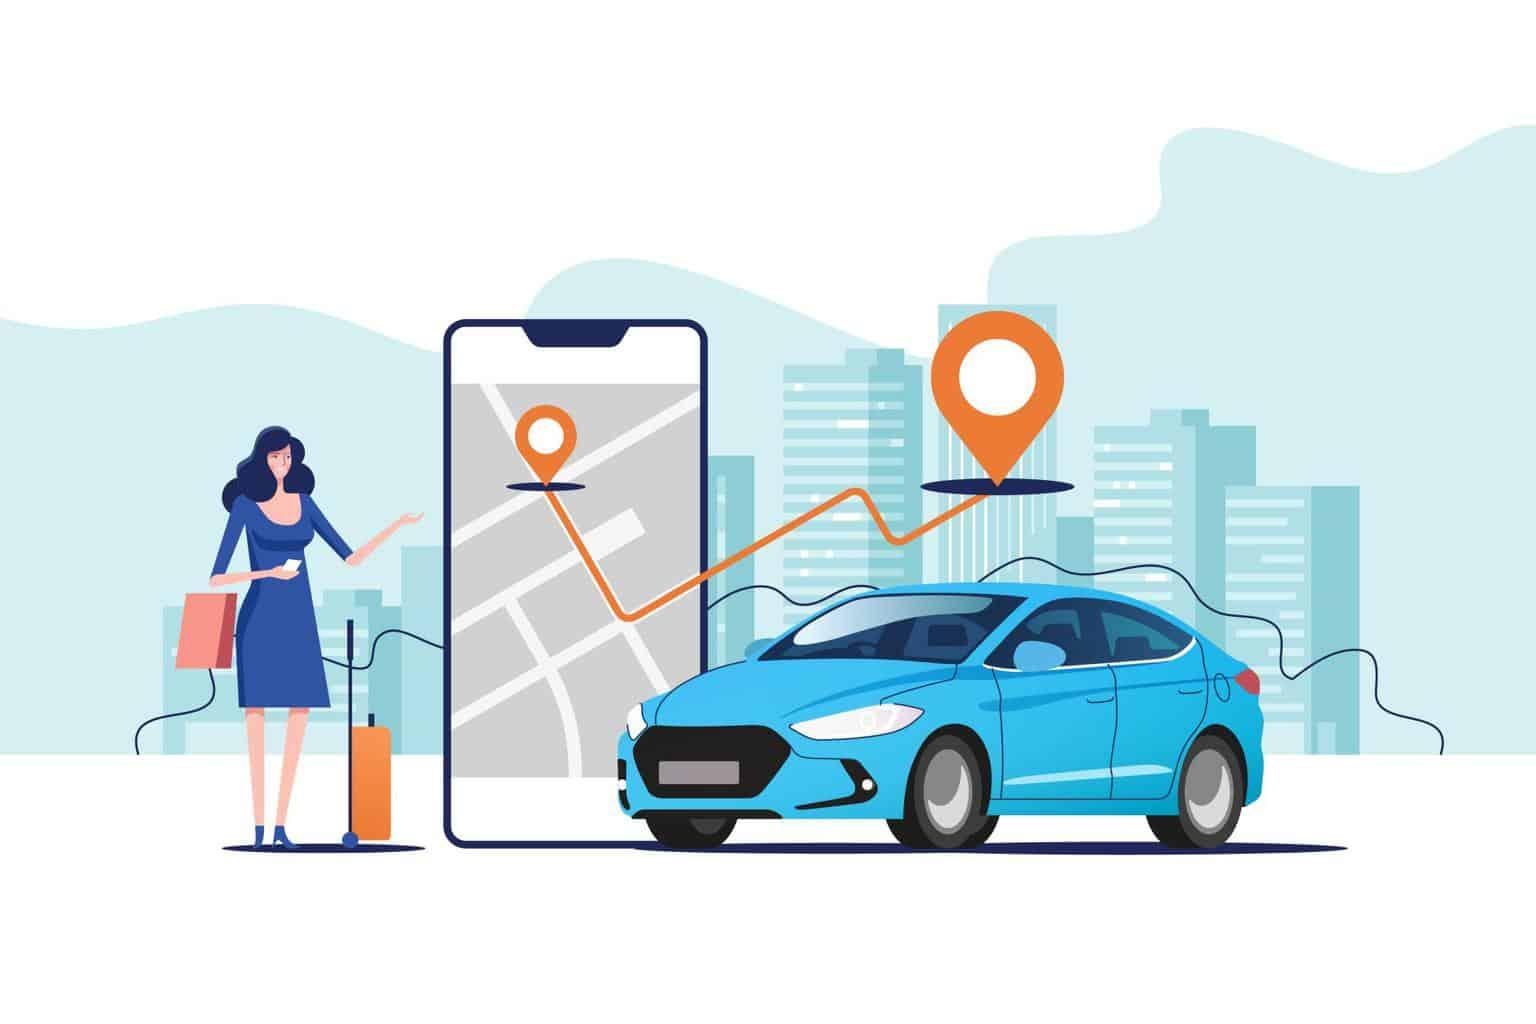 Mobilität nach Corona: Carsharing im Aufwärtstrend